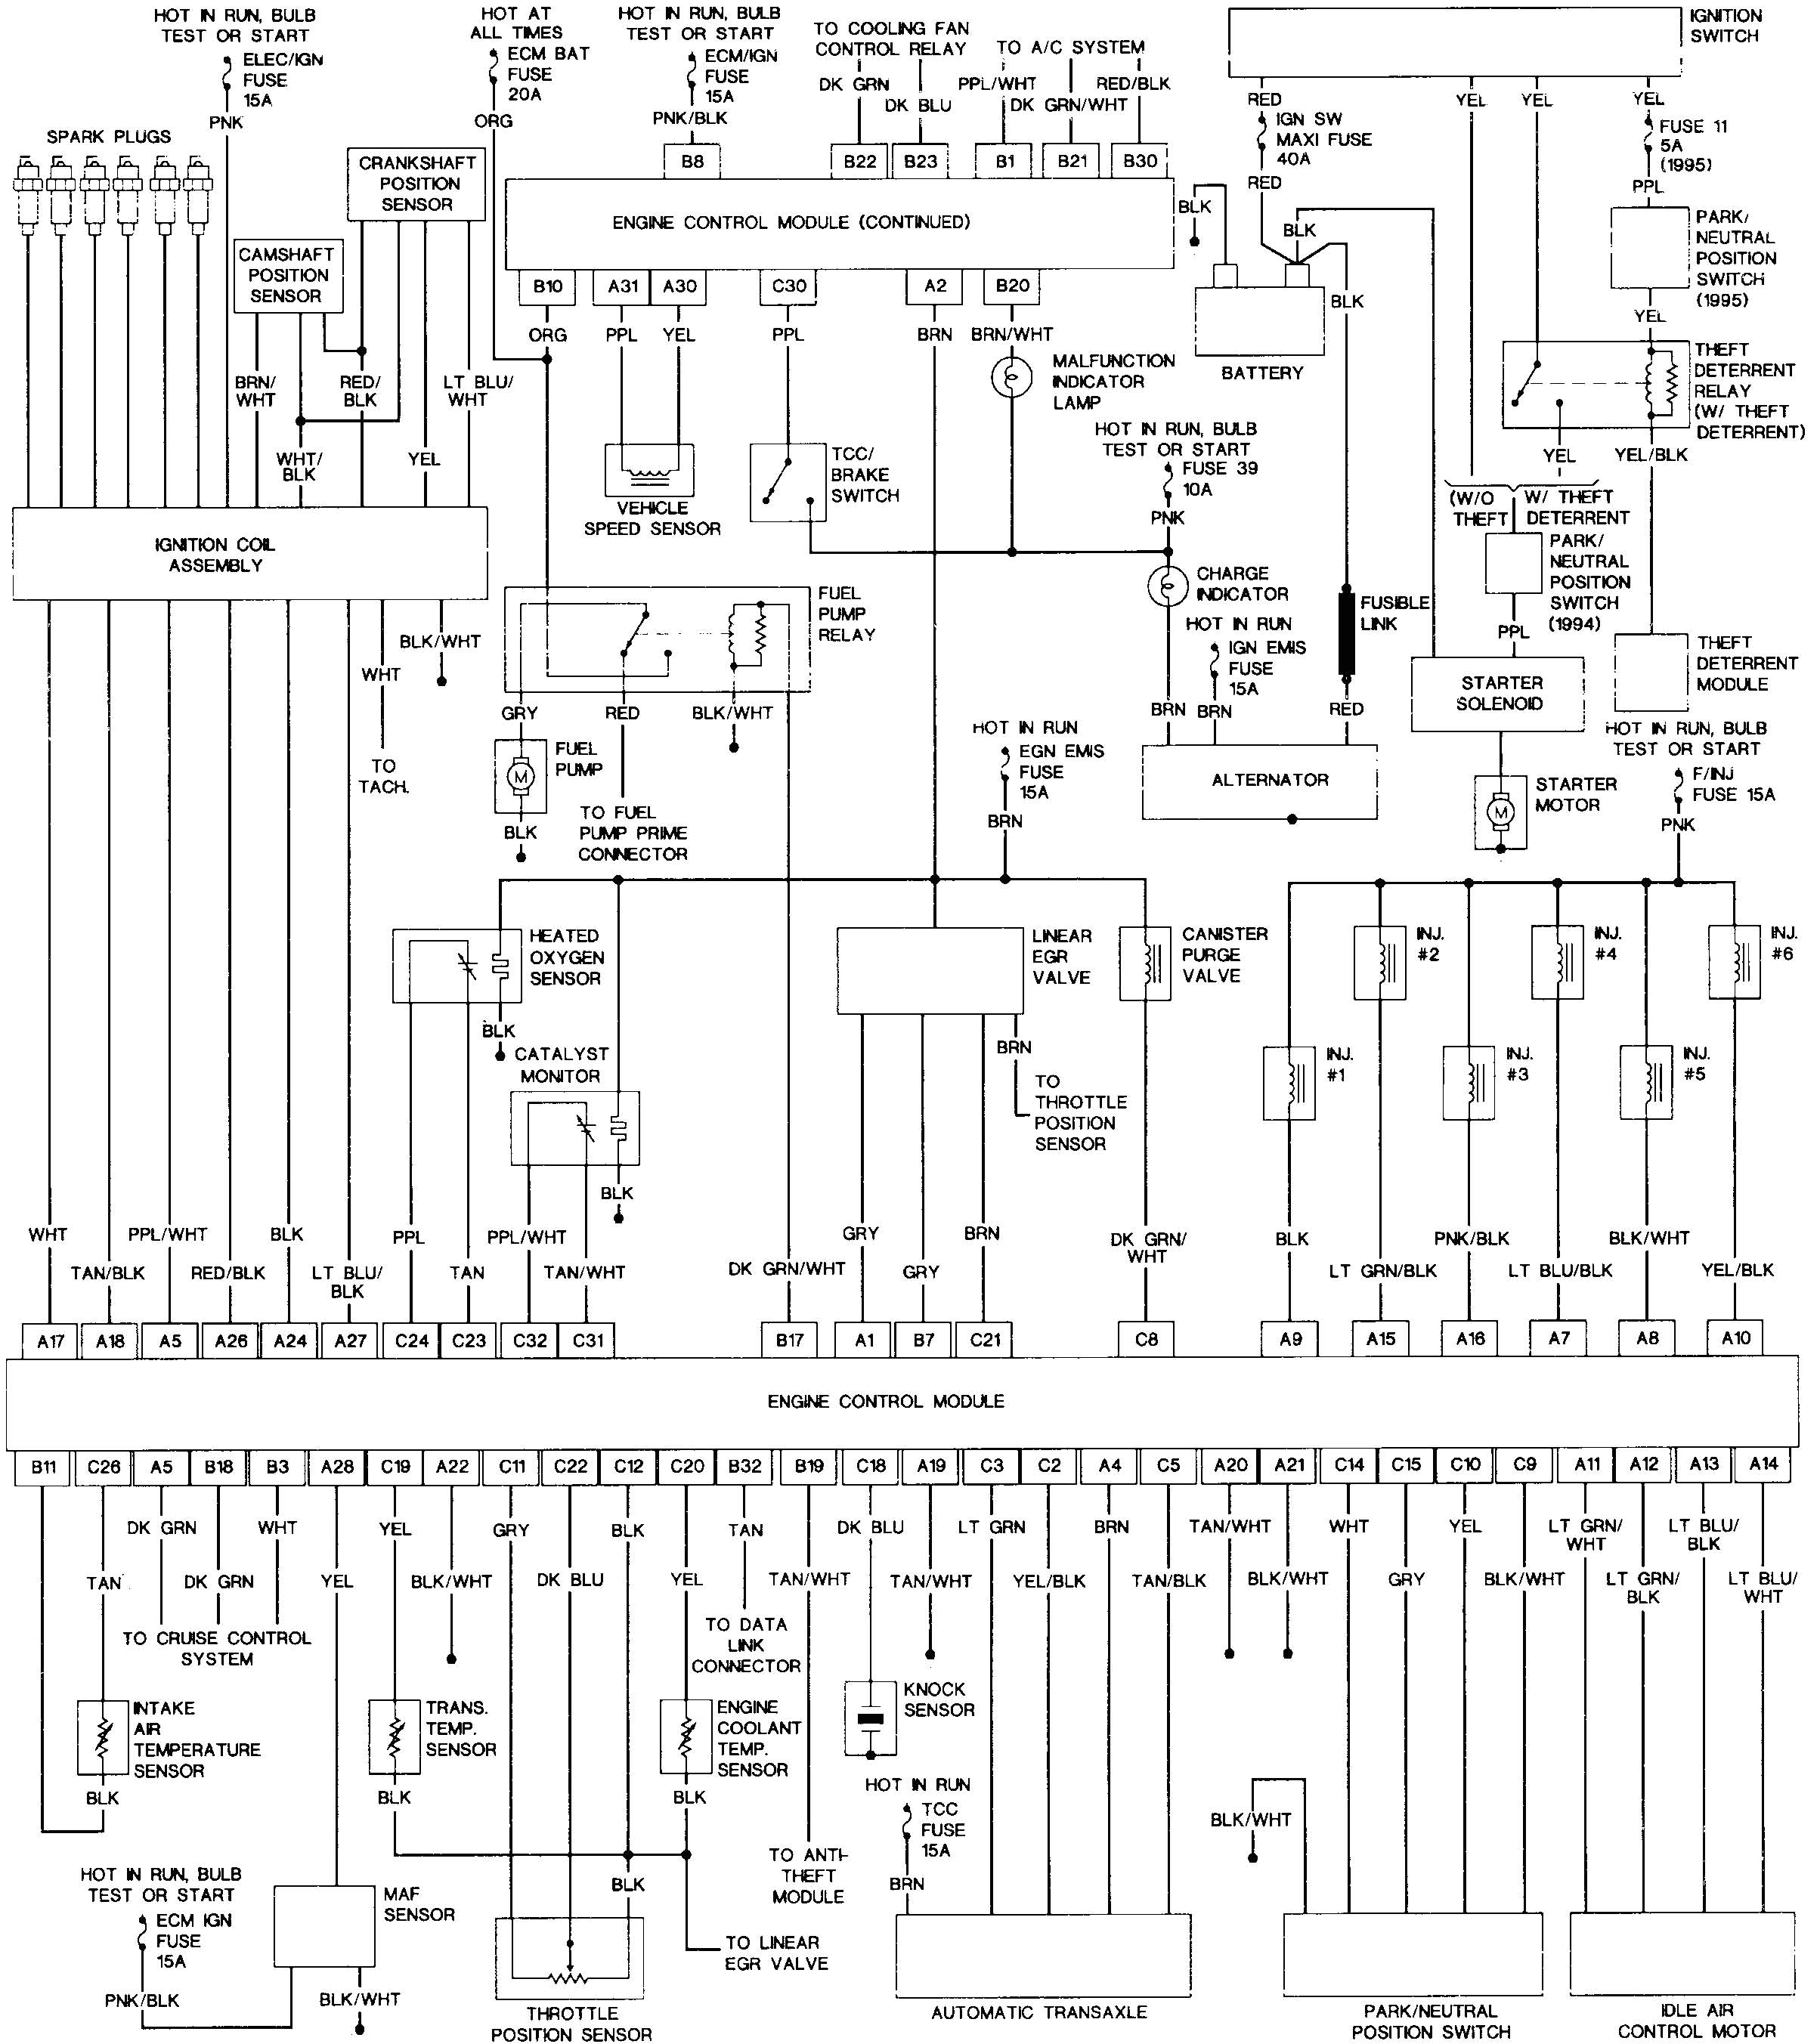 Free Download S470 Wiring Diagram. 68 camaro horn relay wiring harness free  download 68. mack truck wiring diagram free download free wiring diagram.  motorola astro spectra wiring diagram autocardesign. 1979 corvette wiring2002-acura-tl-radio.info